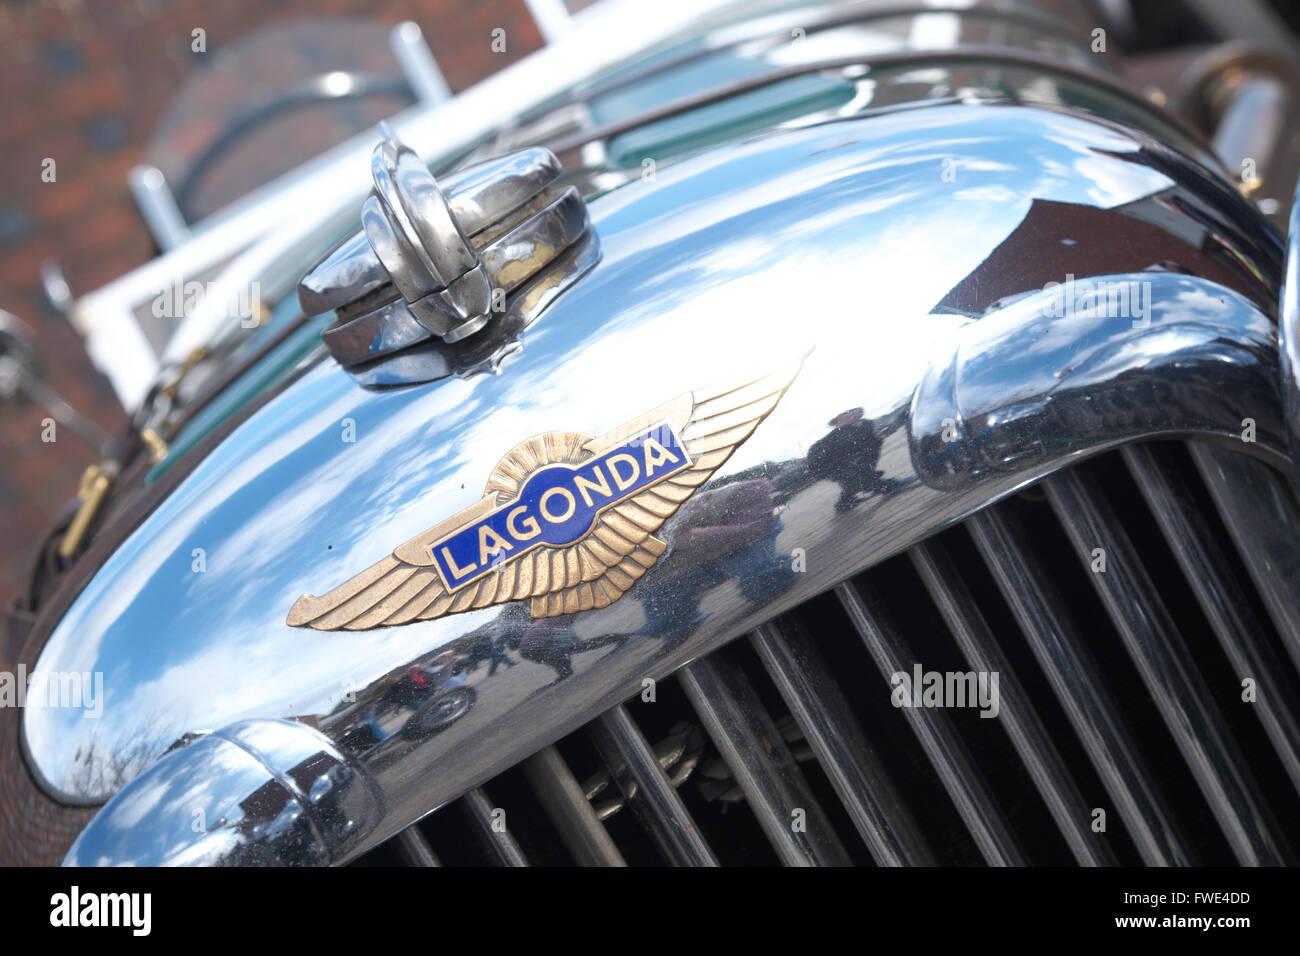 Lagonda vintage classic car brand logo and radiator - Stock Image